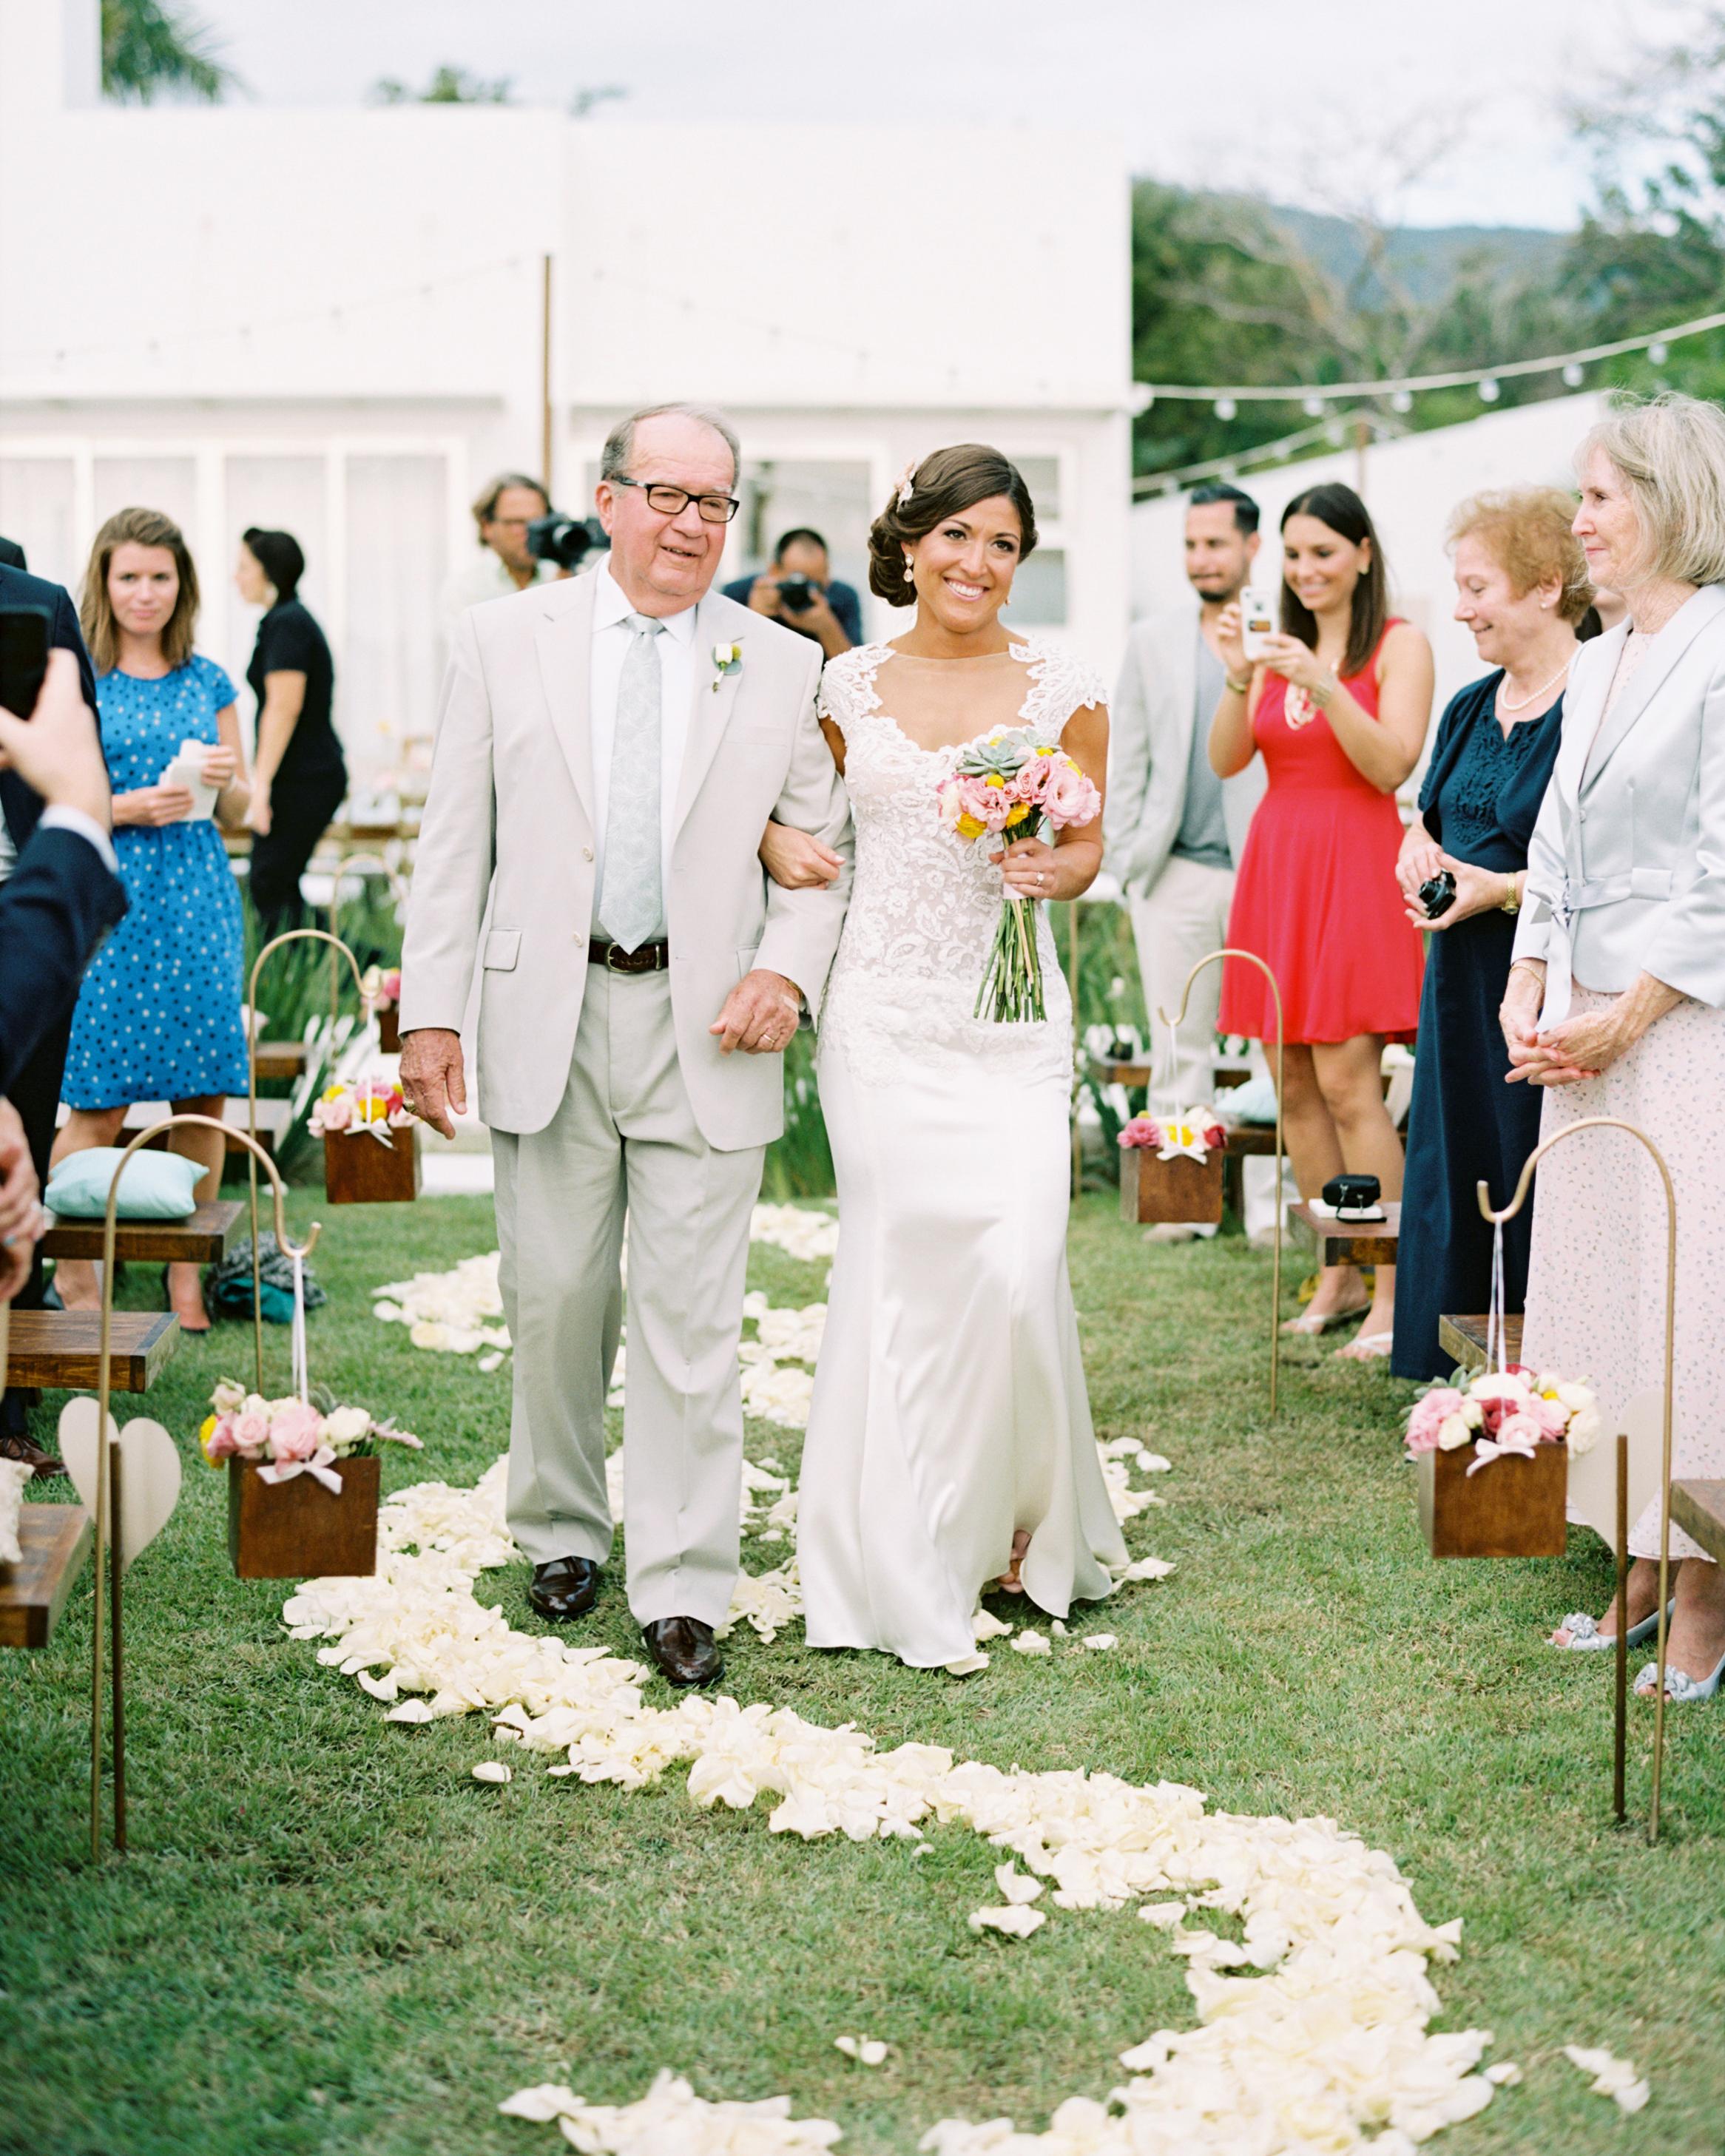 molly-nate-wedding-dad-144-s111479-0814.jpg